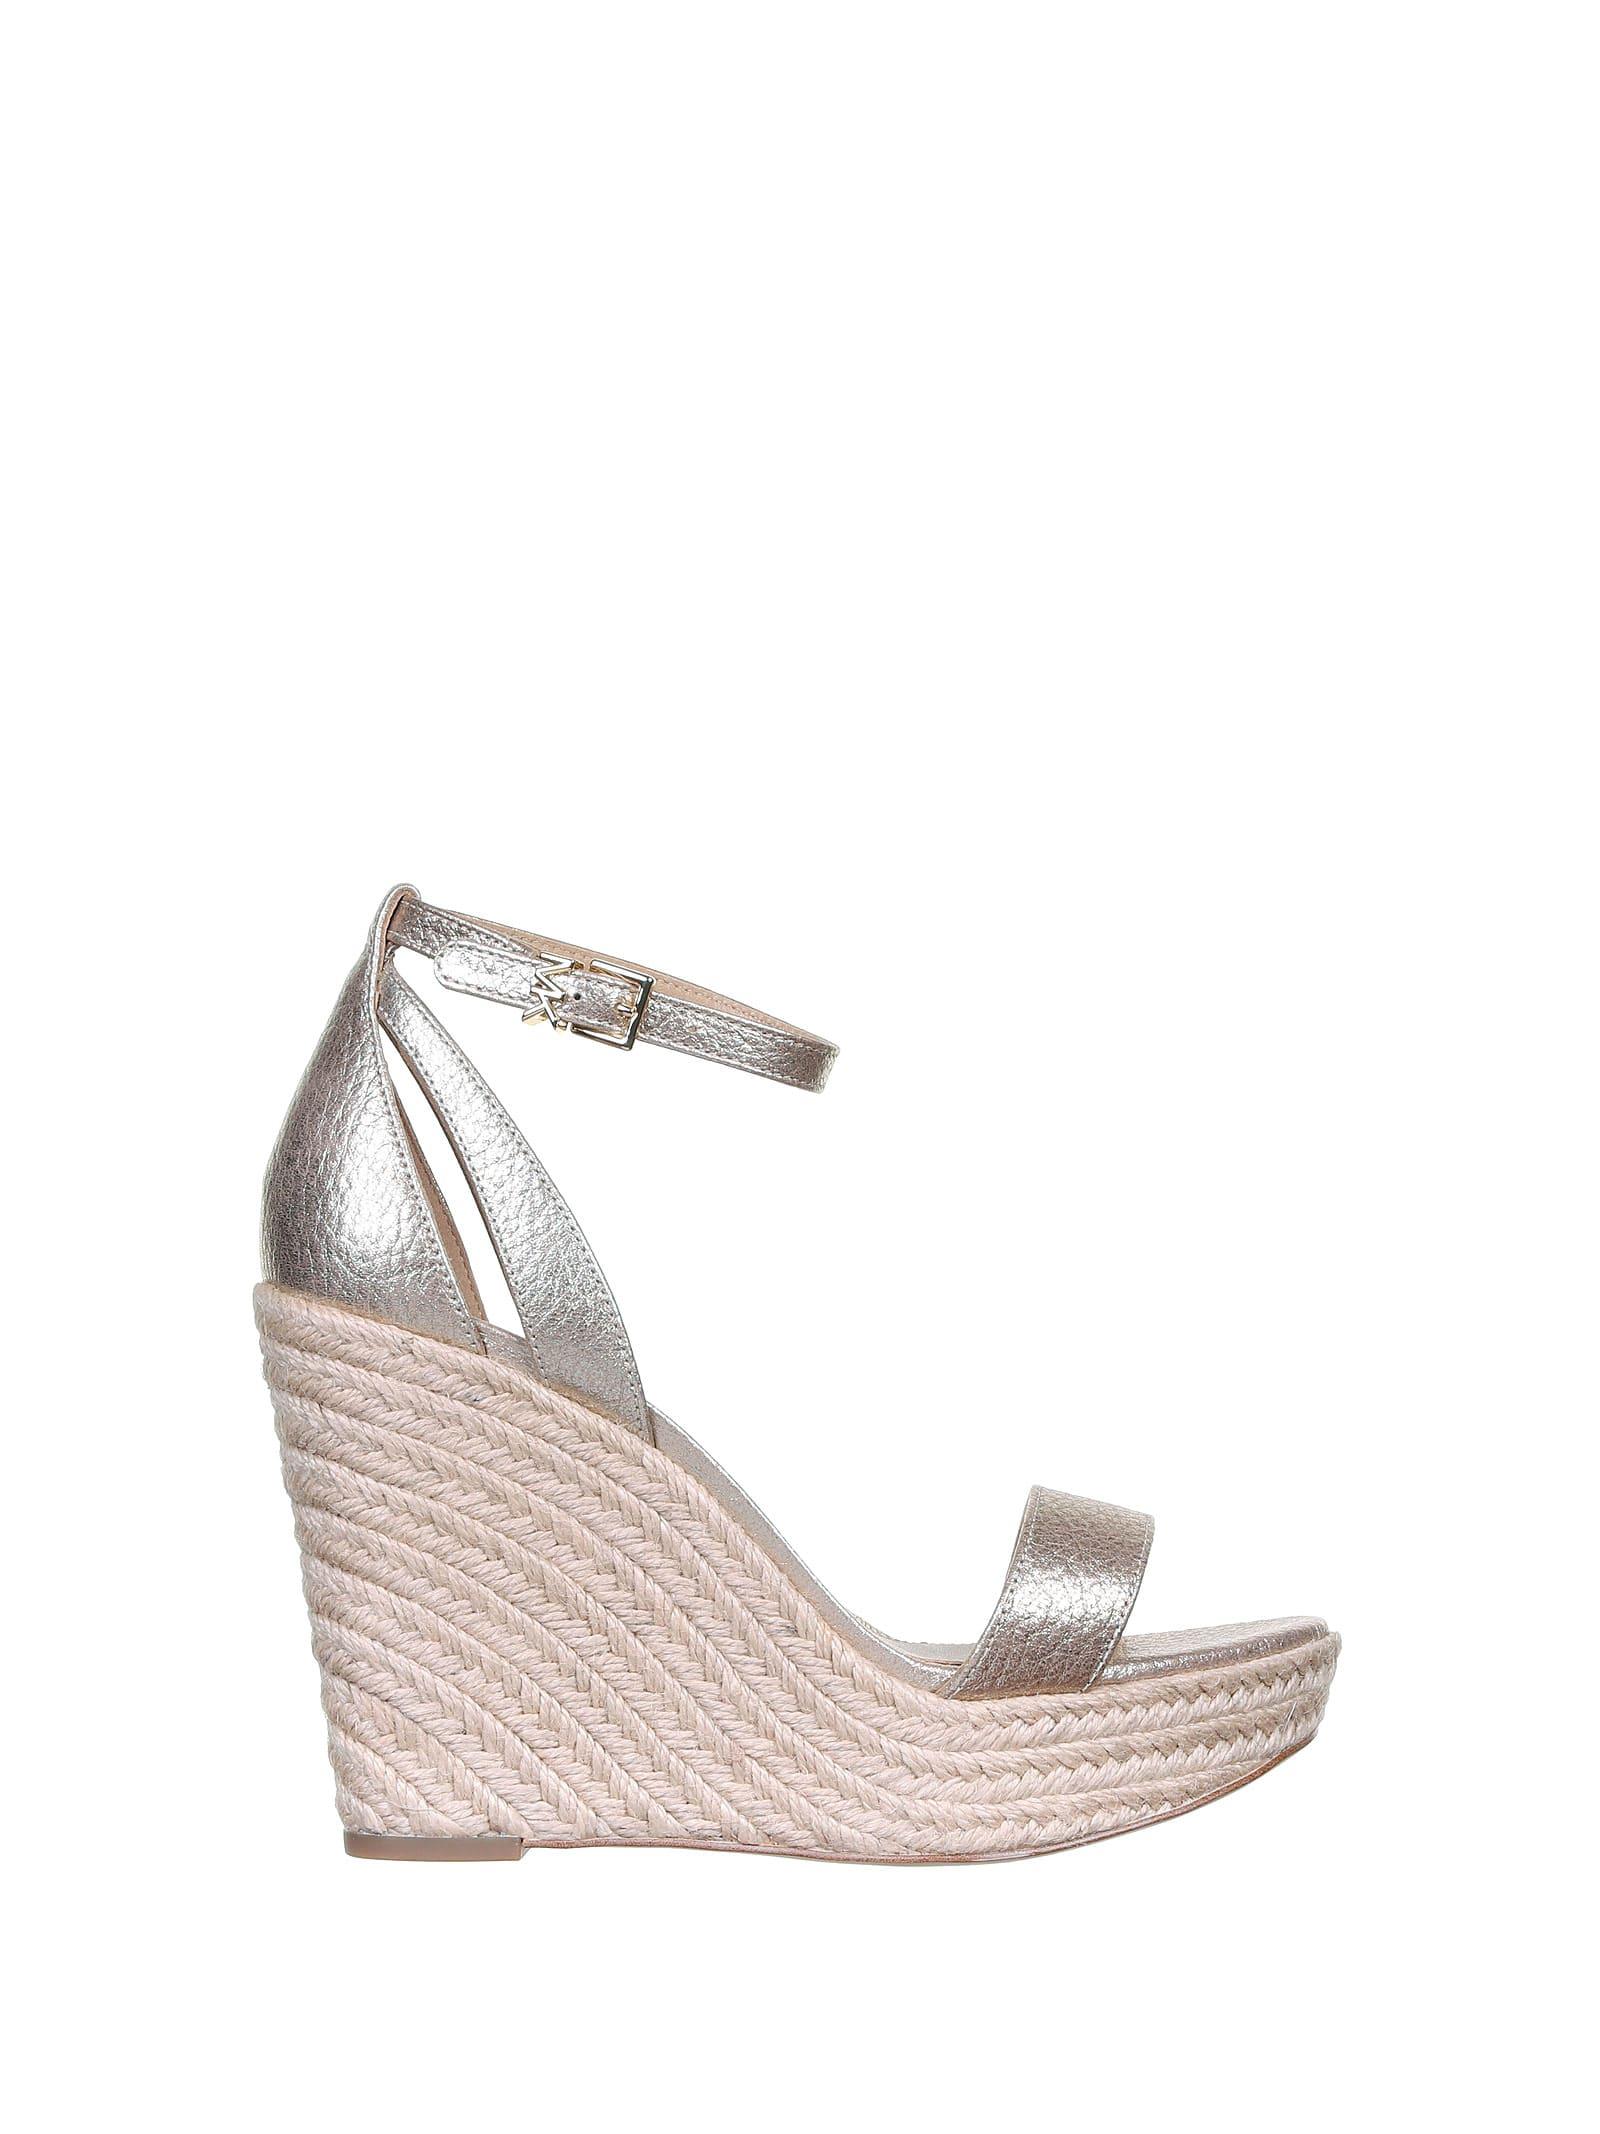 Buy MICHAEL Michael Kors Kimberly Sandals online, shop MICHAEL Michael Kors shoes with free shipping